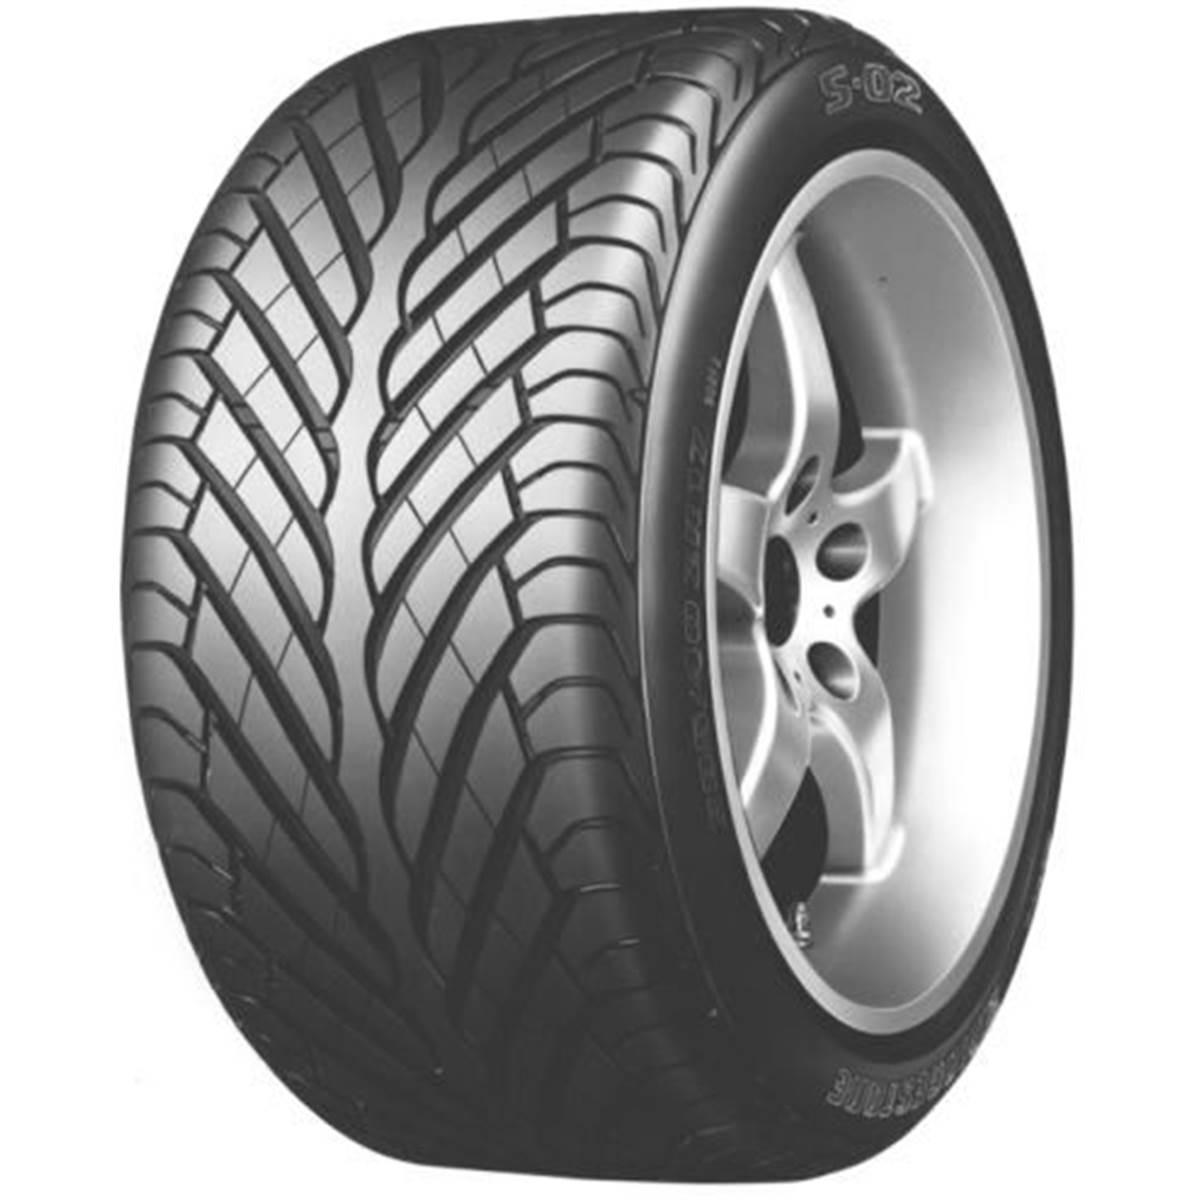 Pneu Bridgestone 205/55R16 Z Potenza S02